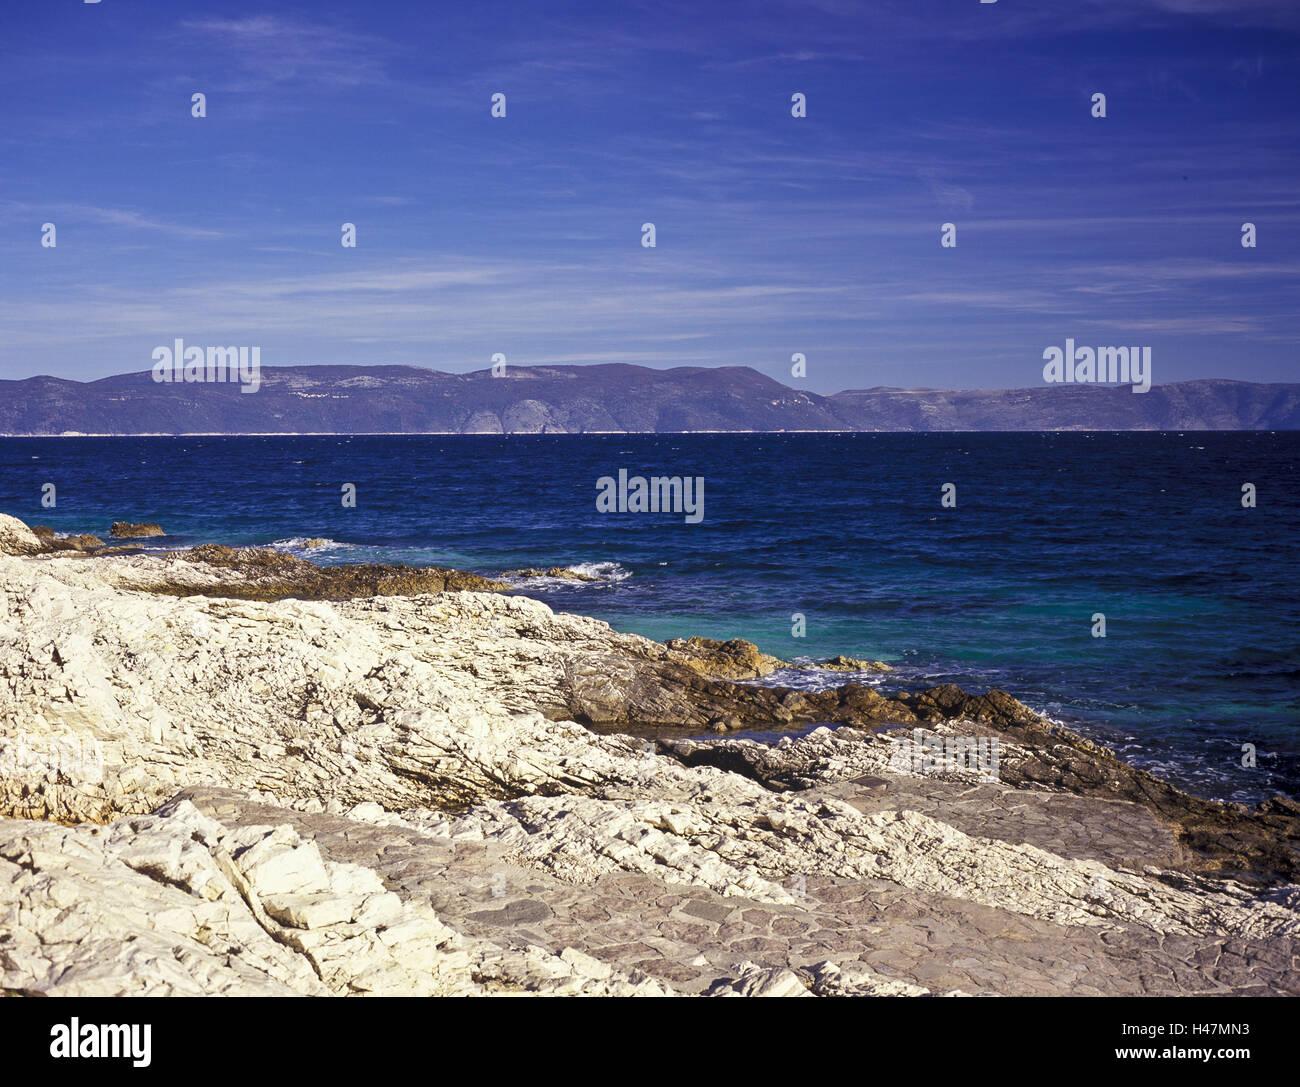 Croatia, Istria, Kvarner bay, Rabac, bile coast, mountains, sea, Adriatic, seaside resort, the Balkans, colours, - Stock Image